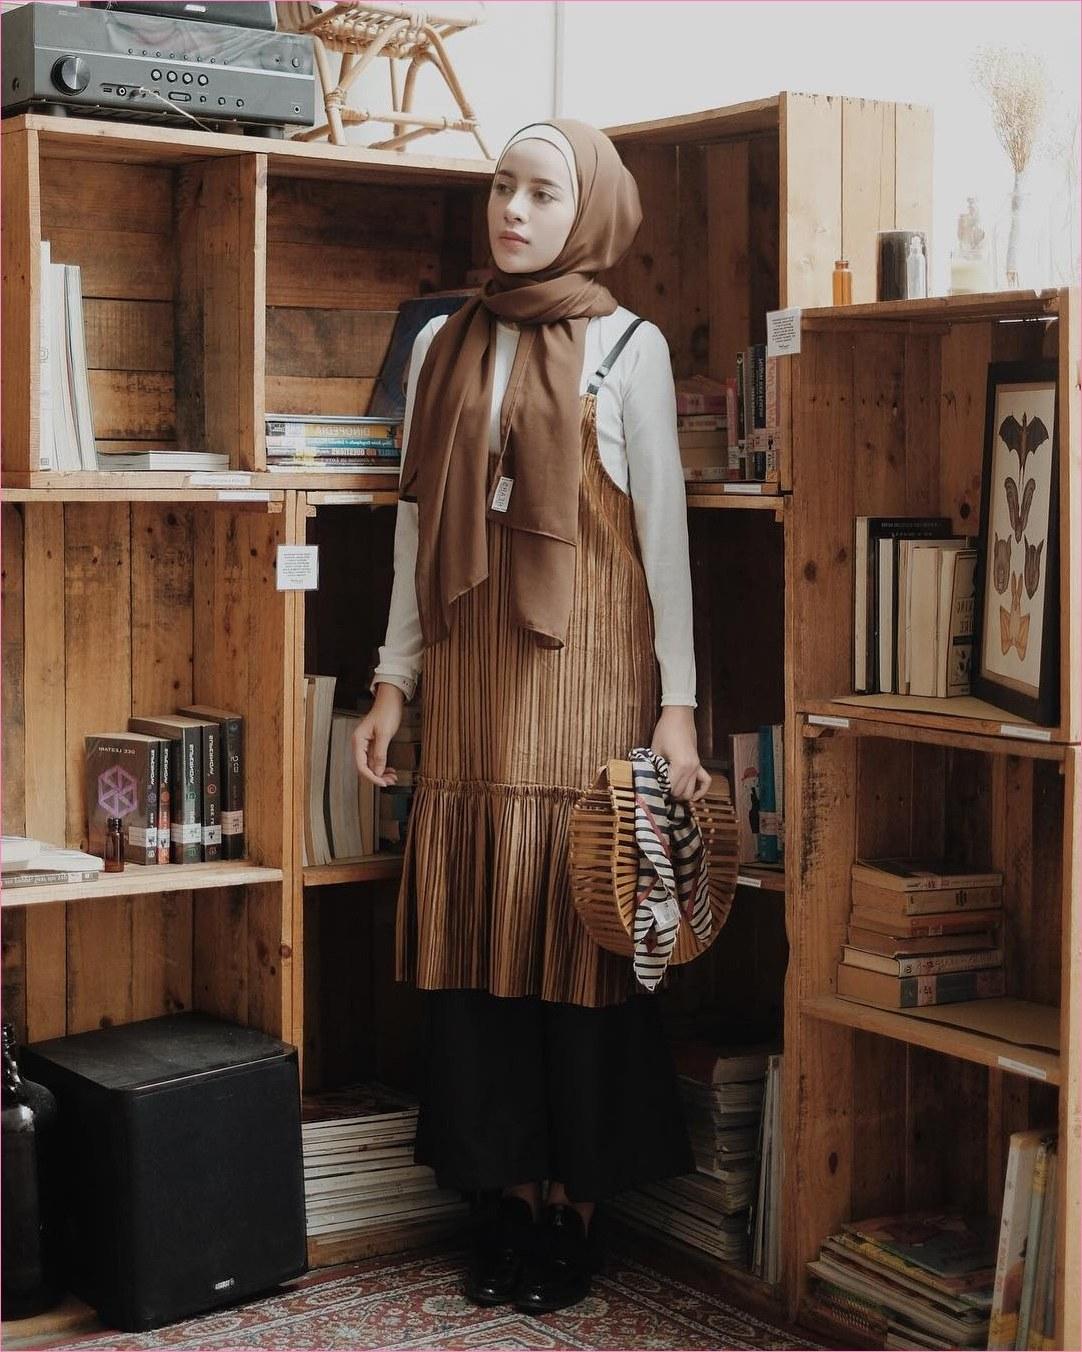 Model Motif Baju Lebaran 2019 Whdr 80 Model Baju Lebaran Terbaru 2019 Muslimah Trendy Model